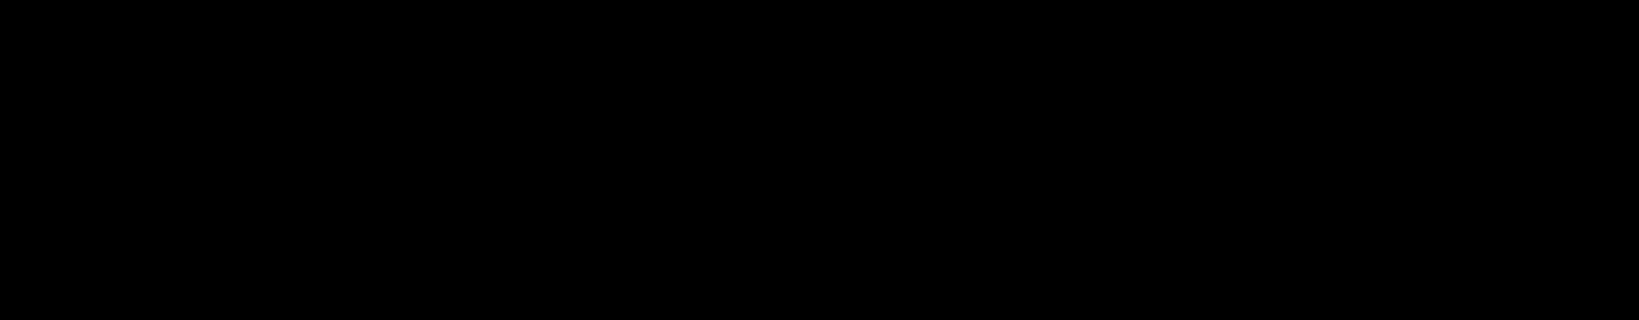 carbon-slime-wallsOghprW0kysvU2